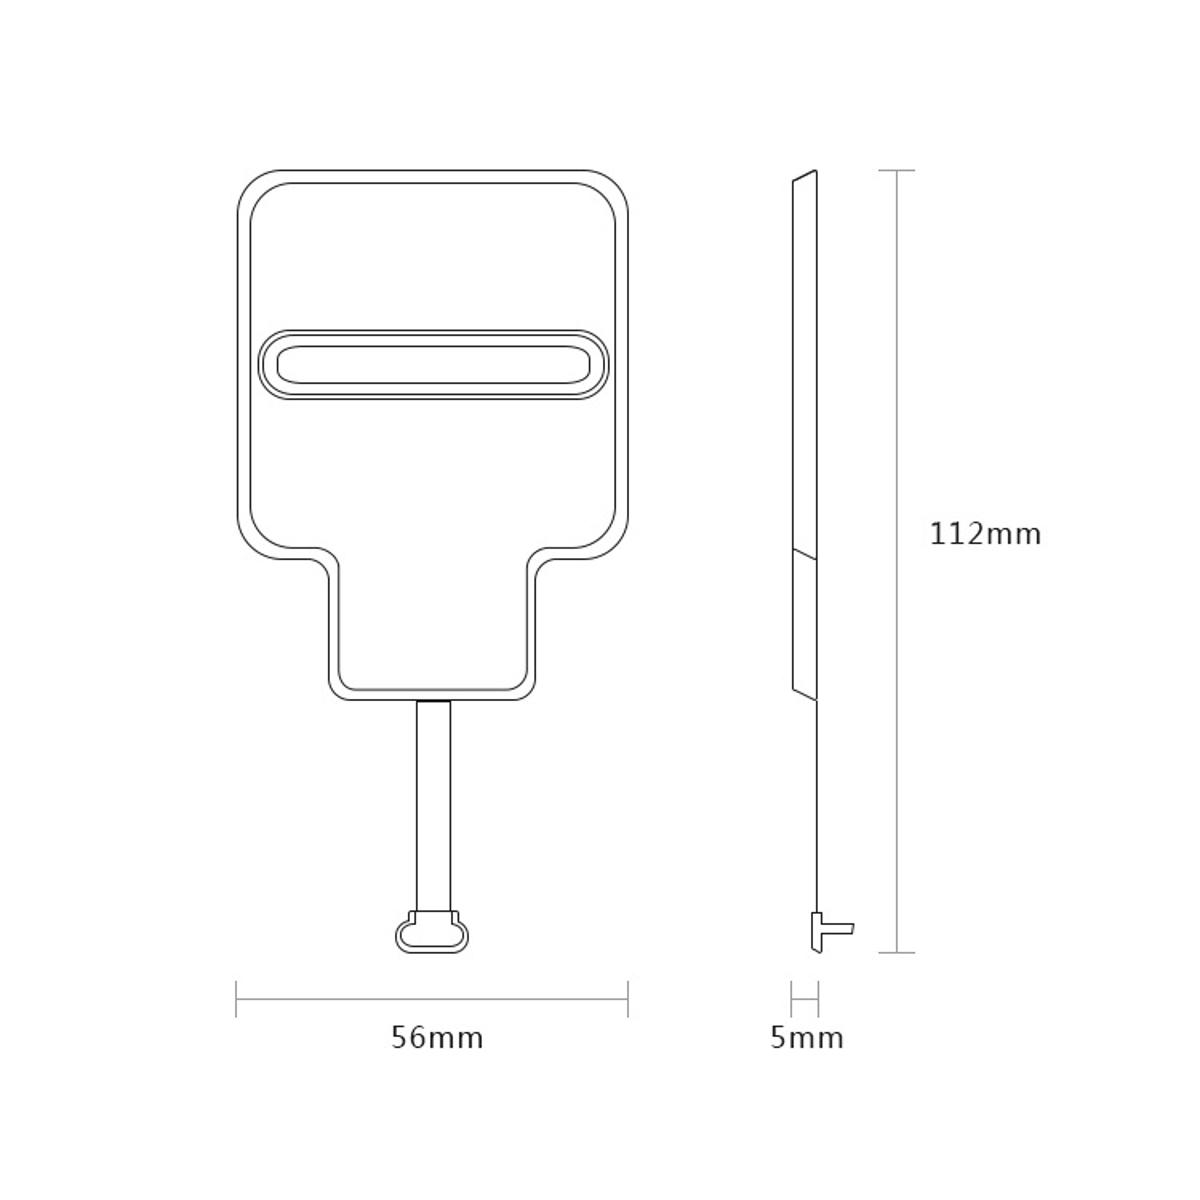 Bakeey Micro USB Qi Беспроводное зарядное устройство Приемник Для Redmi 5 Plus Примечание 5 4 4X S7 S6 - фото 10